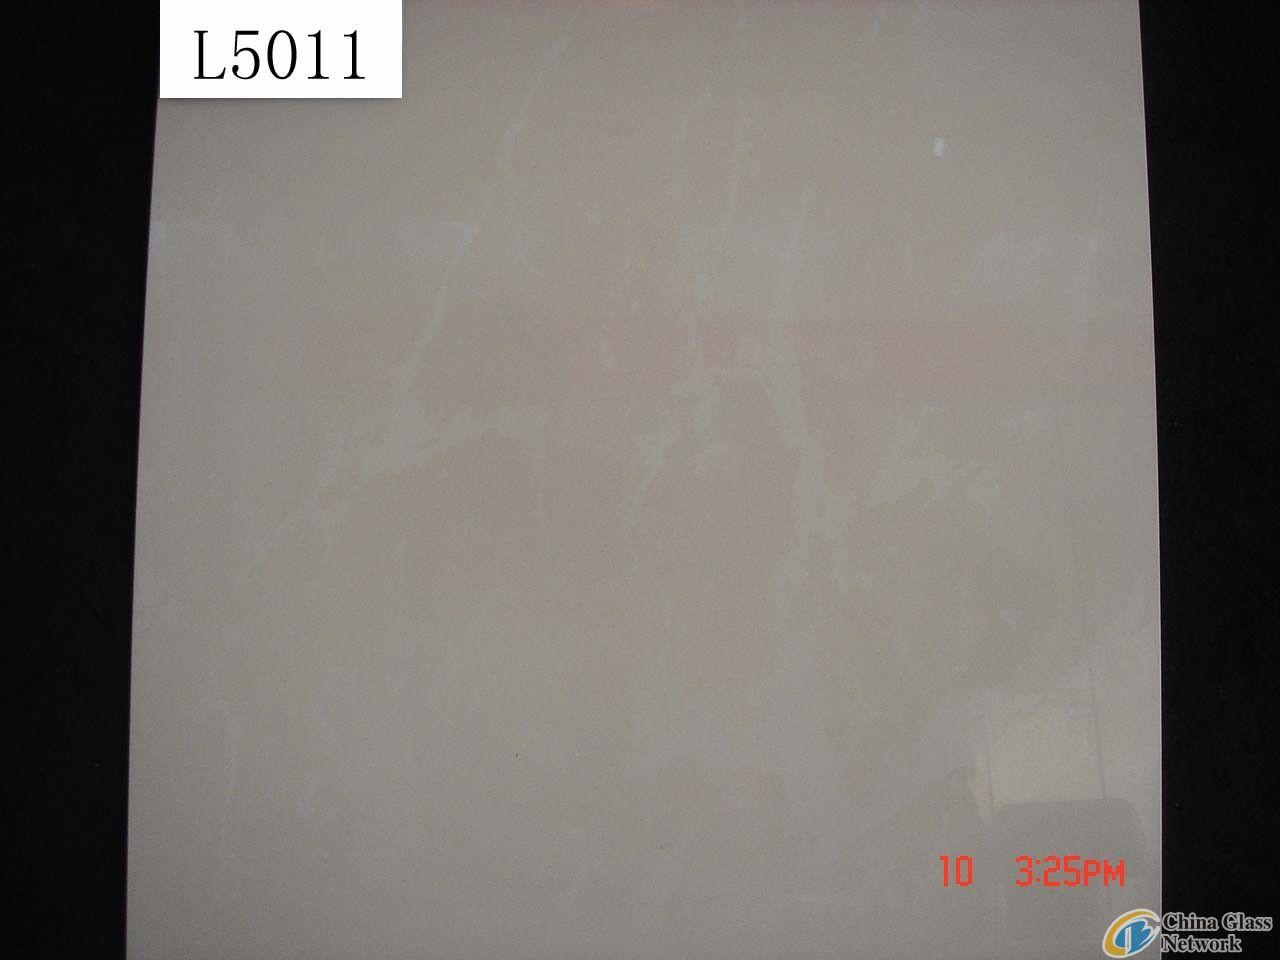 High quality soluble salt tiles L5011